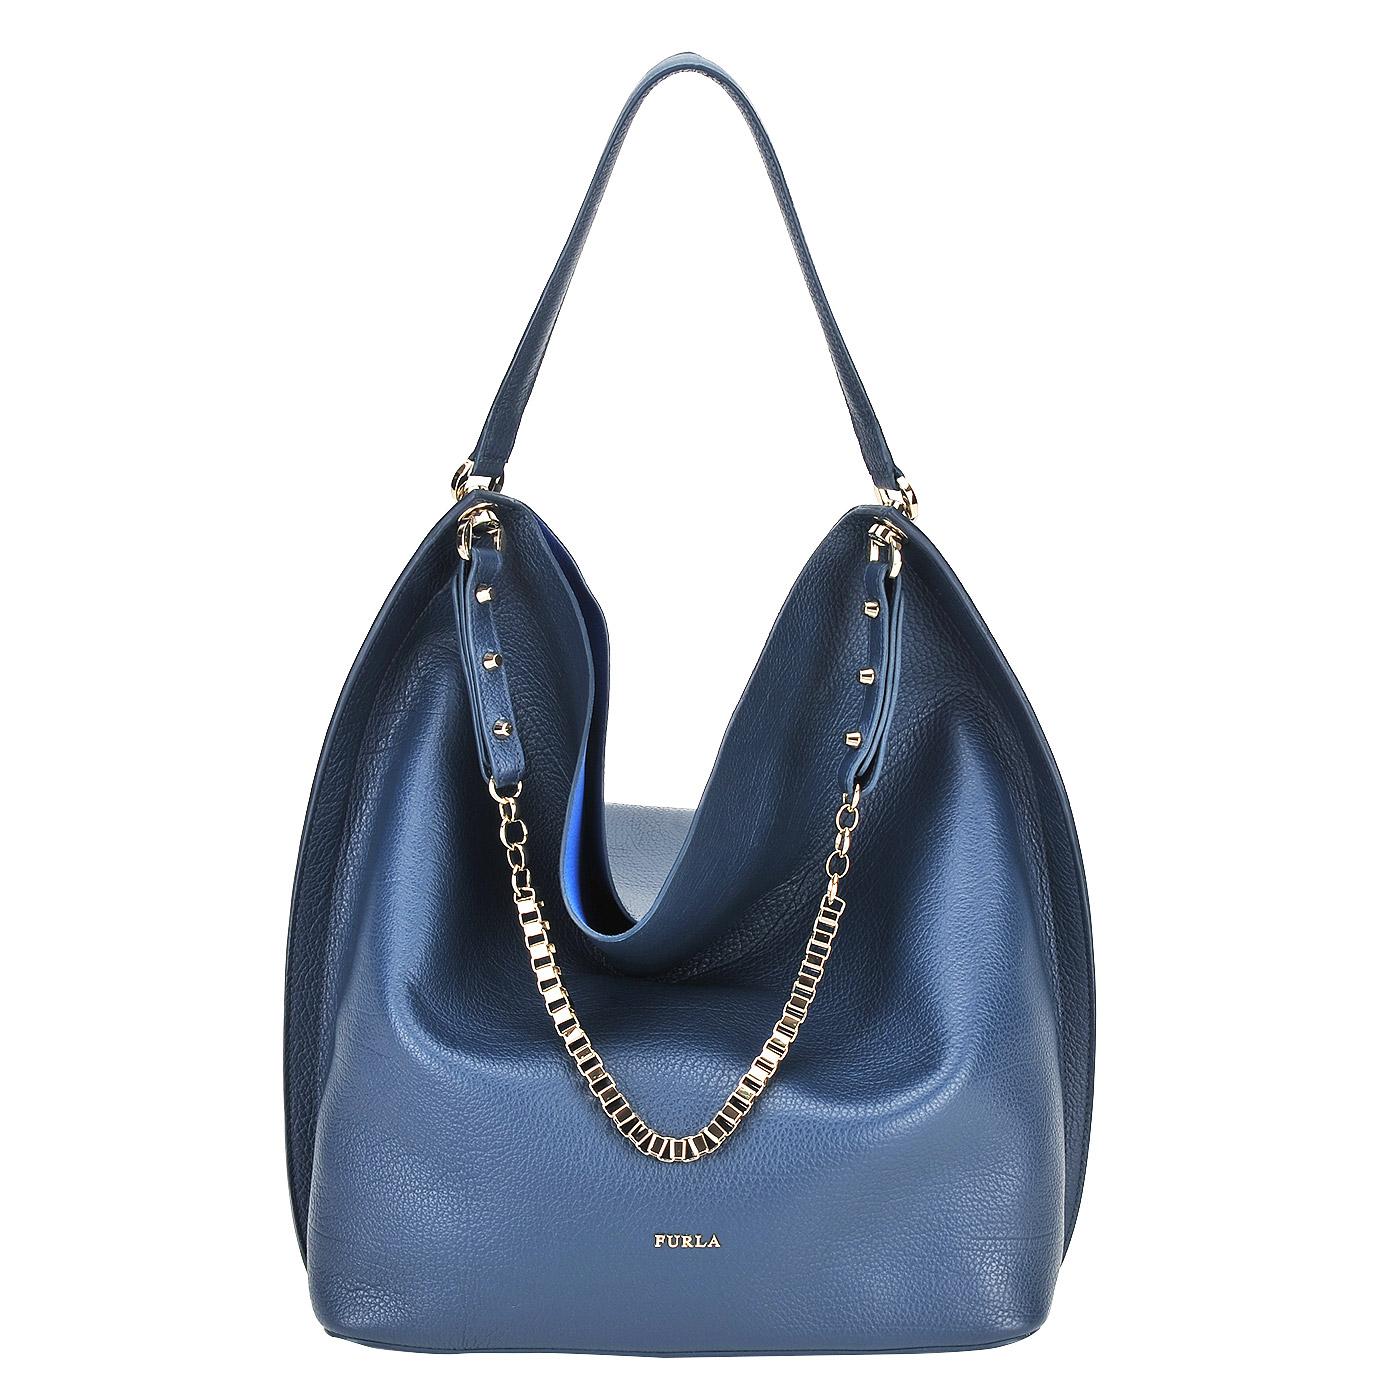 e79440bcb40b Сумка Furla Minerva BHW5_lapis - 2000557594685 синий натуральная ...